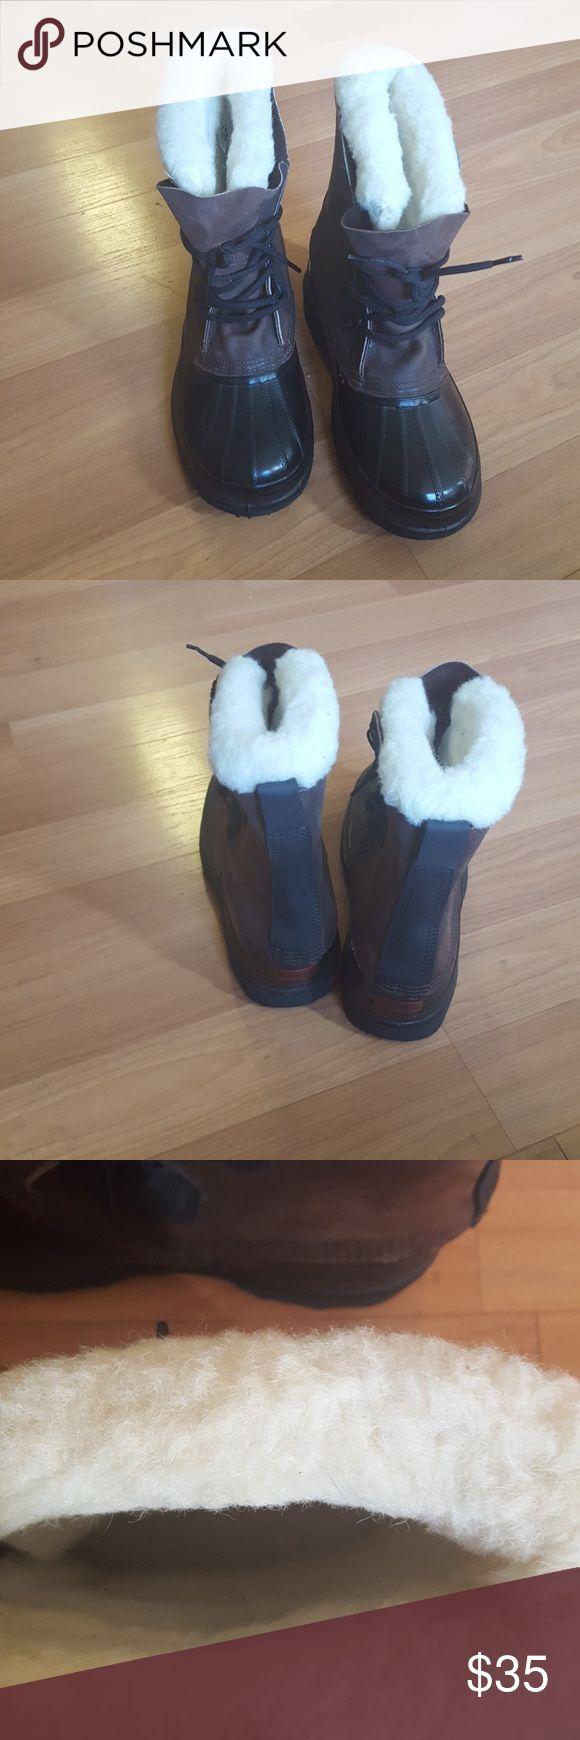 BIGHORN SOREL BOOTS MEN SIZE 10 BIGHORN SOREL WINTET  PRE LOVED BIGHORN SOREL Shoes Rain & Snow Boots